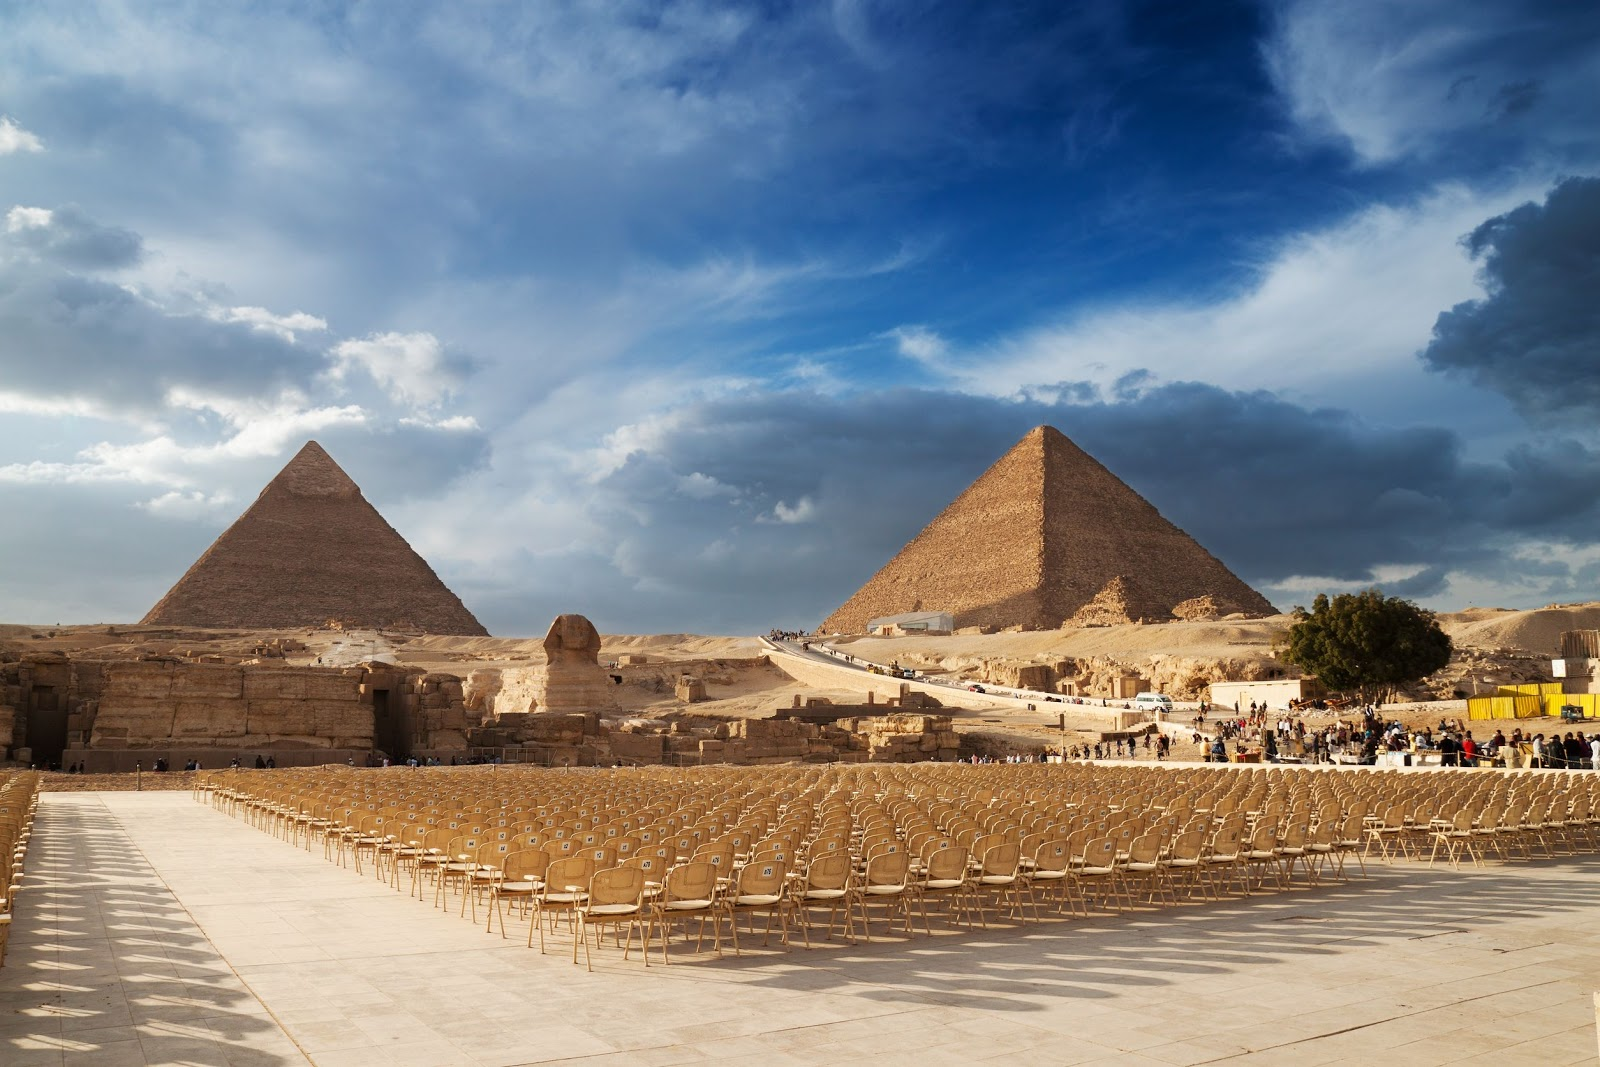 Necropole De Gizeh Fond D Ecran Pyramides De Gizeh 1600x1067 Wallpapertip